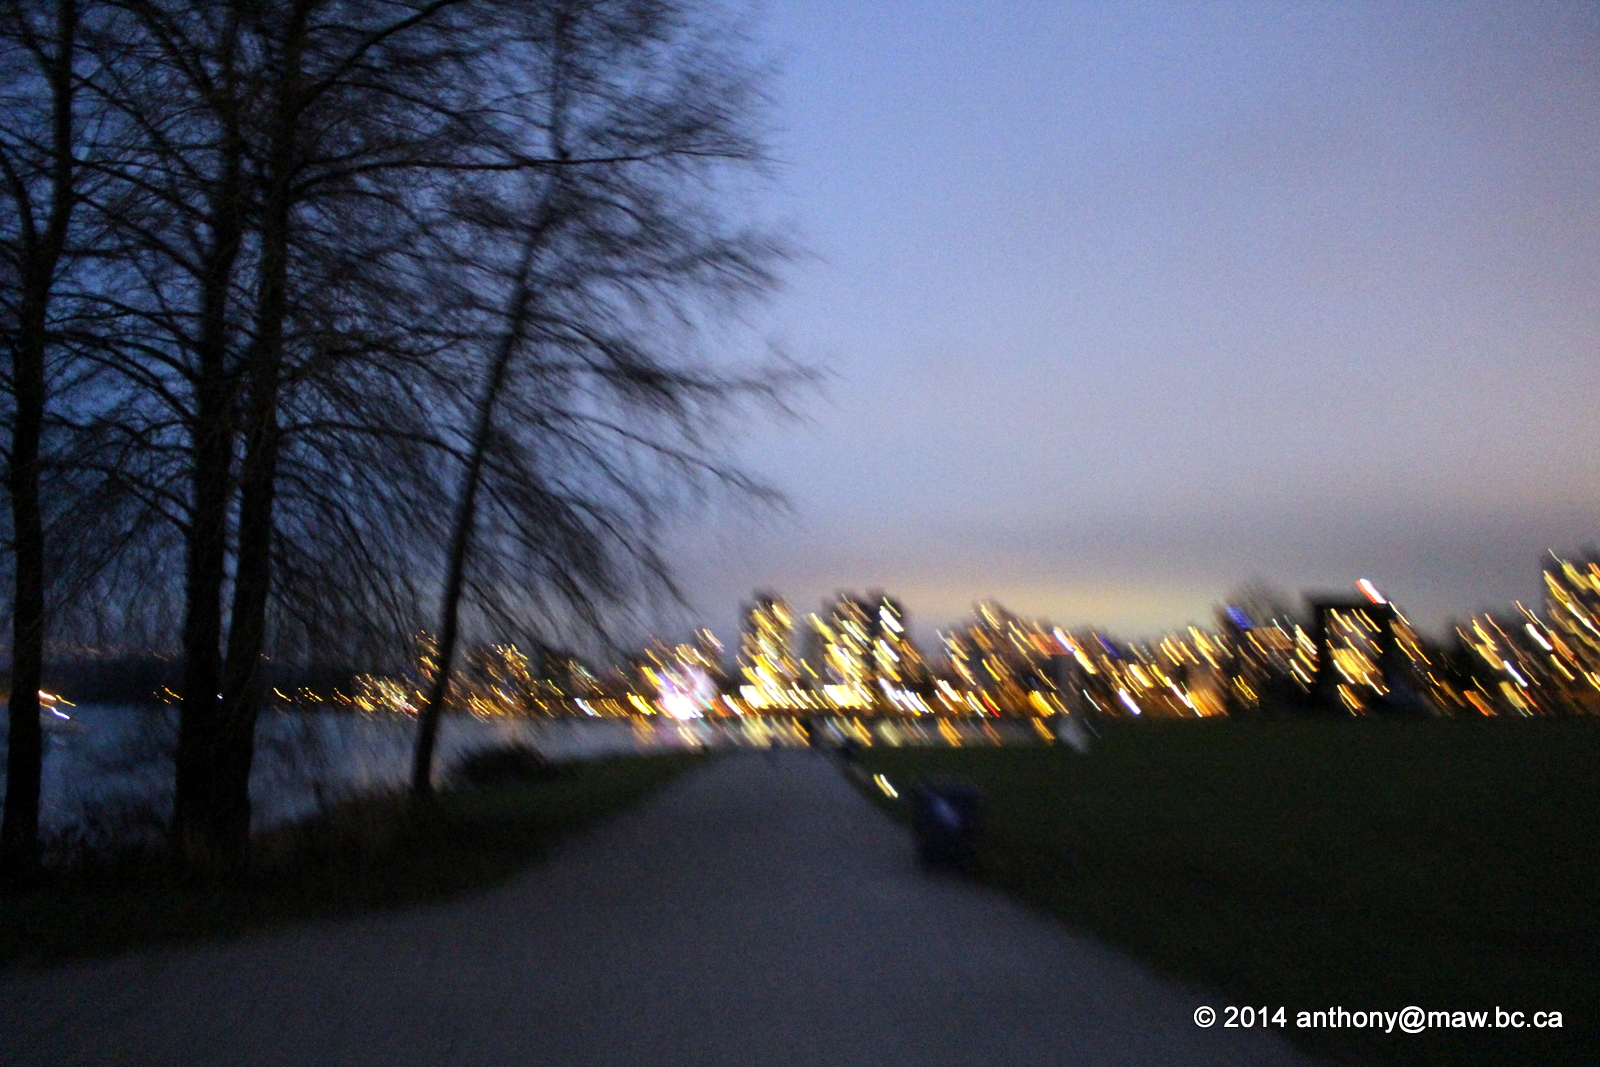 IMG_8431 2014-12-06 Vancouver Kitsilano Views. autumn, winter, sunset, urban, canada, motion, vancouver, landscape, evening, harbour, lifestyle, westcoast. buy photo